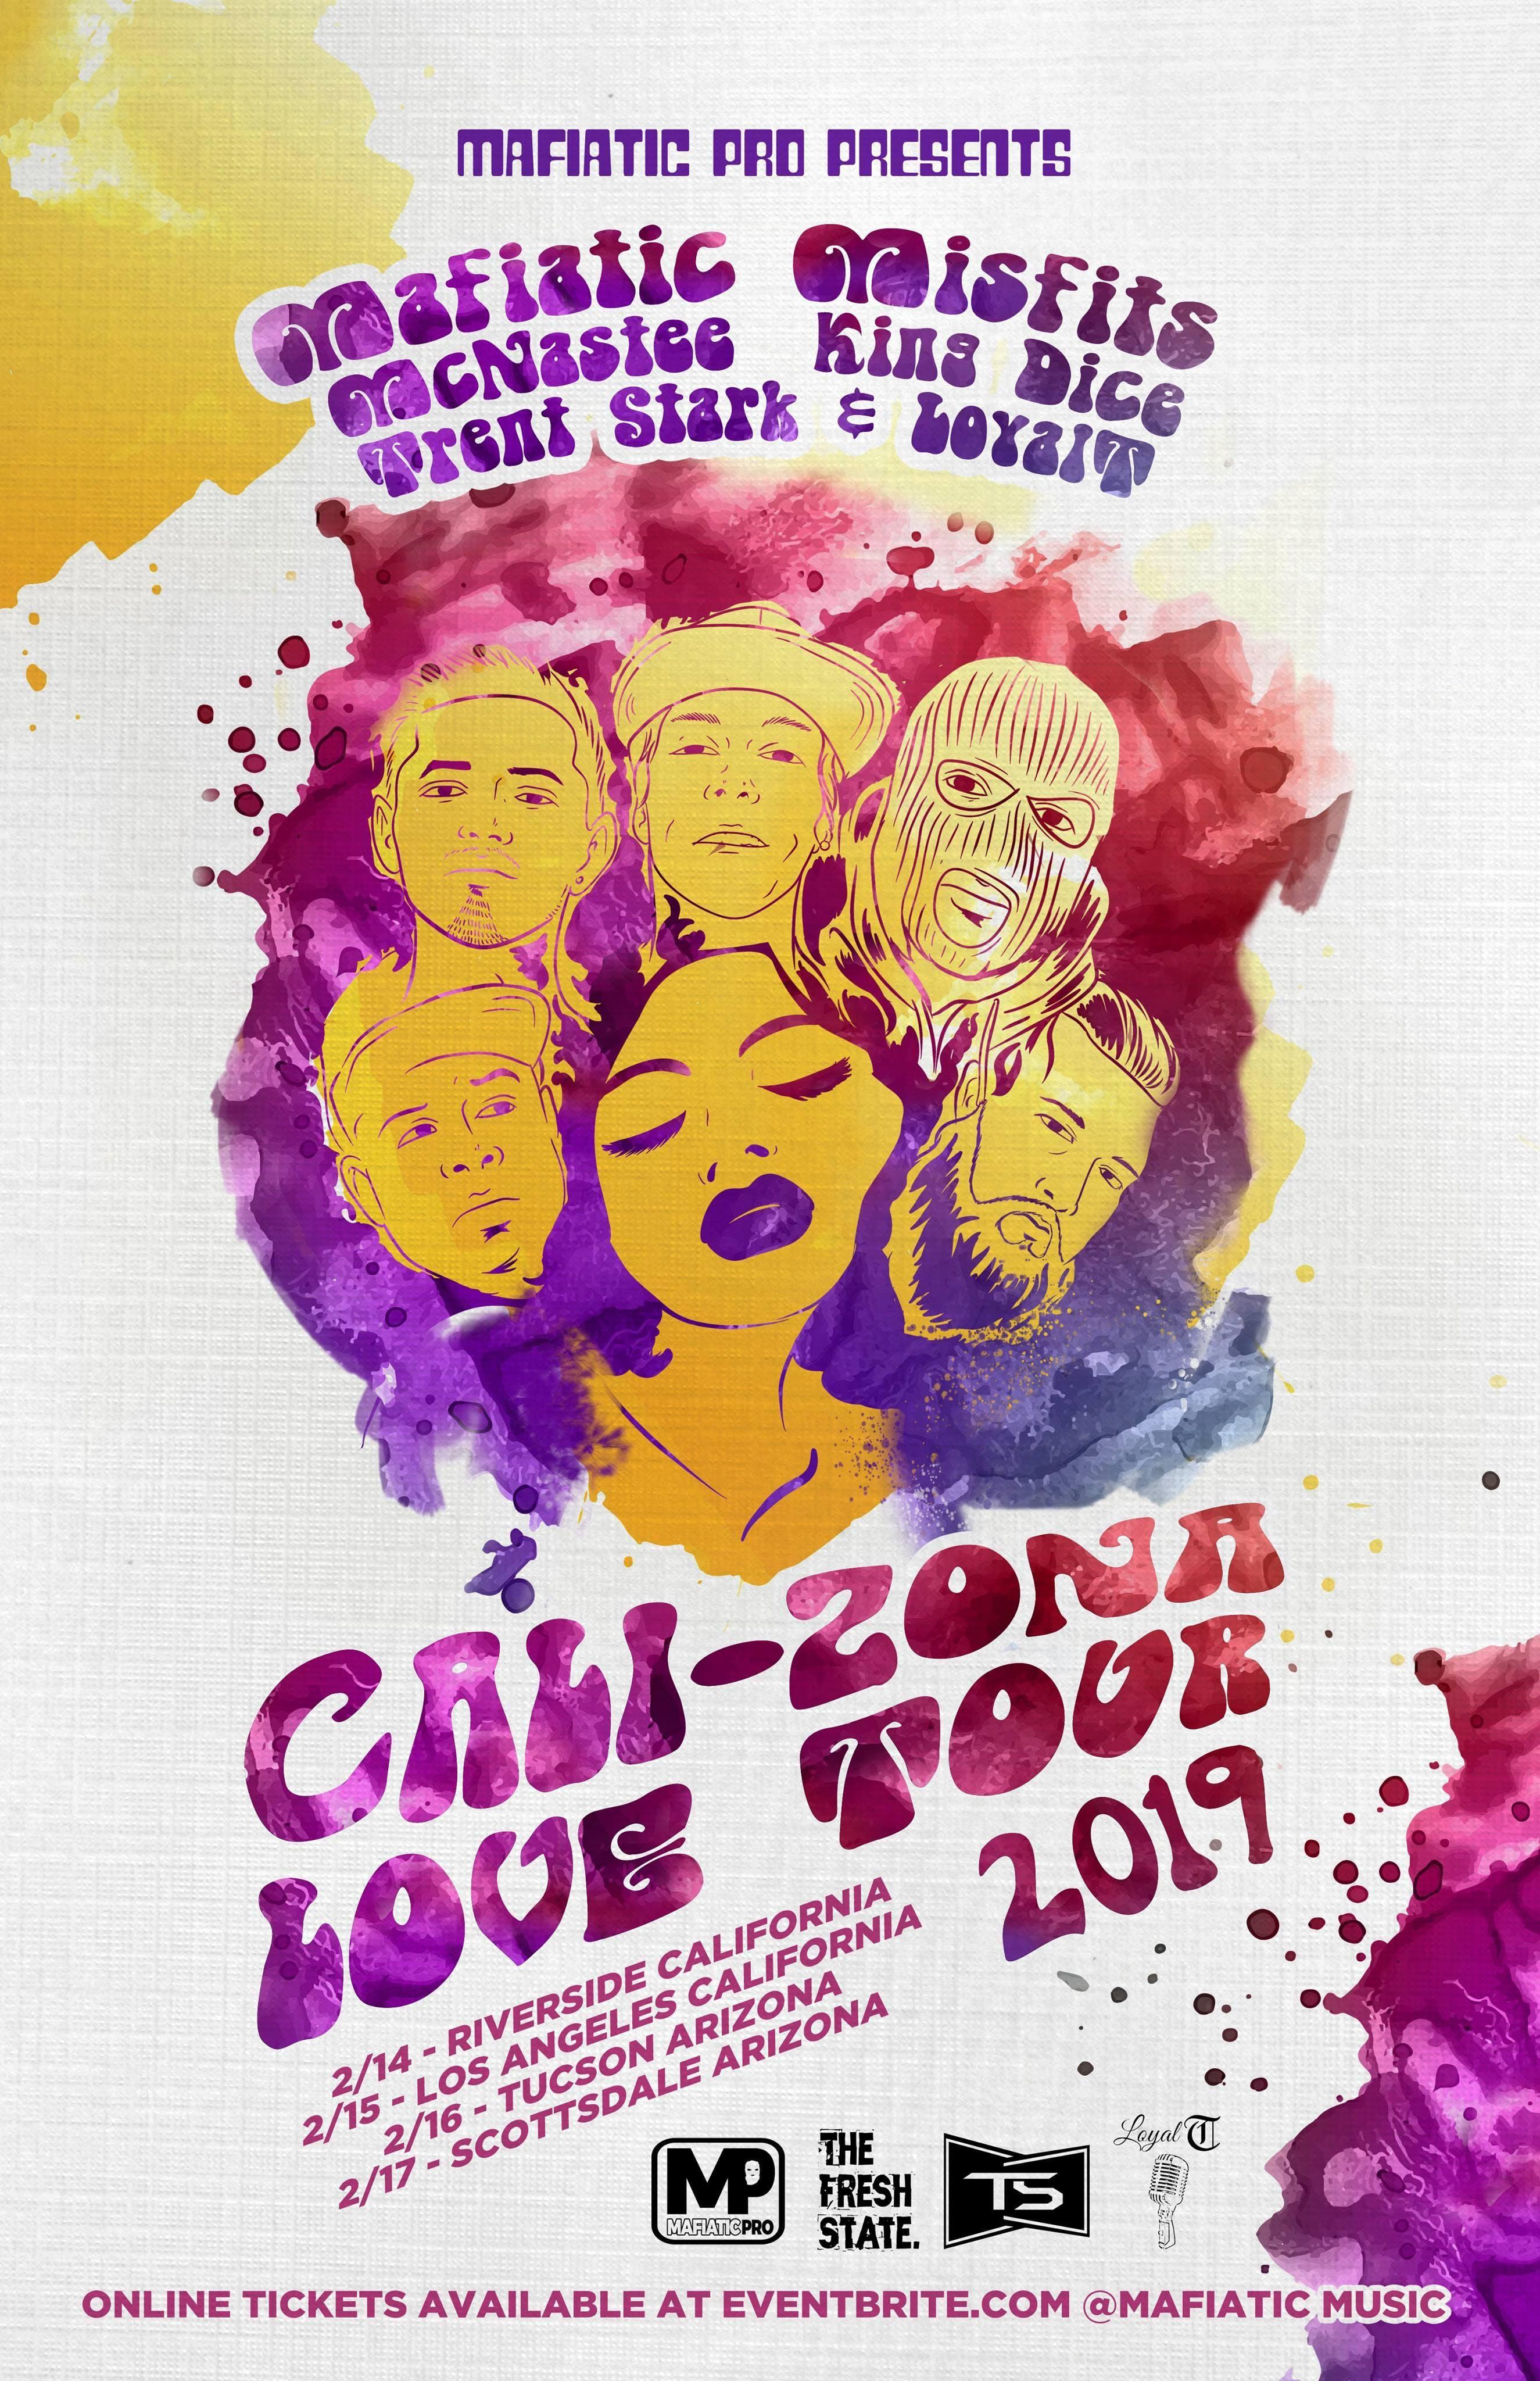 The Cali-Zona Love Tour 2019 (Tucson Az)